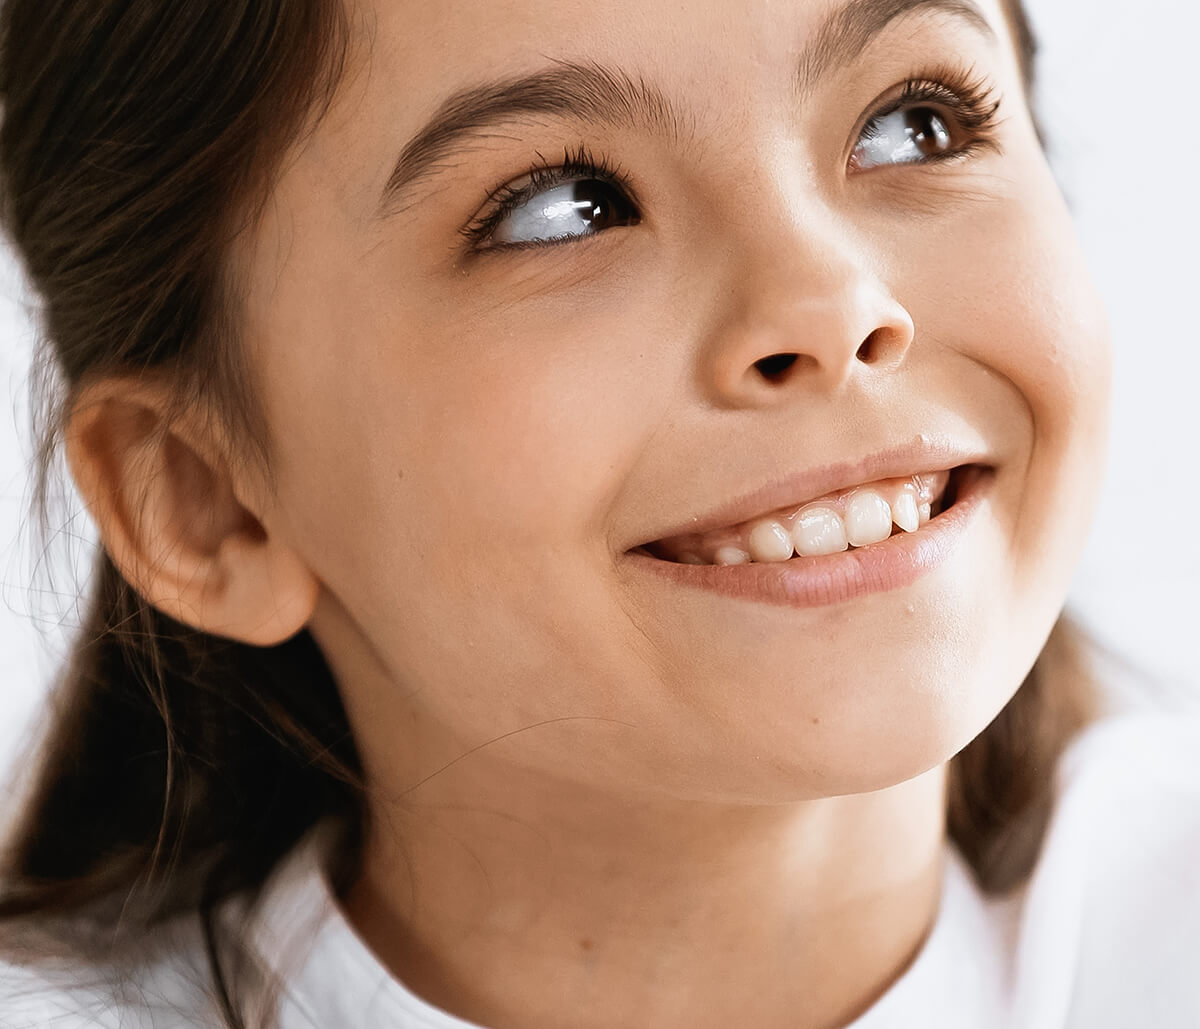 Holistic Kids Dentist at Virtue Dental Care in Yadkinville NC Area